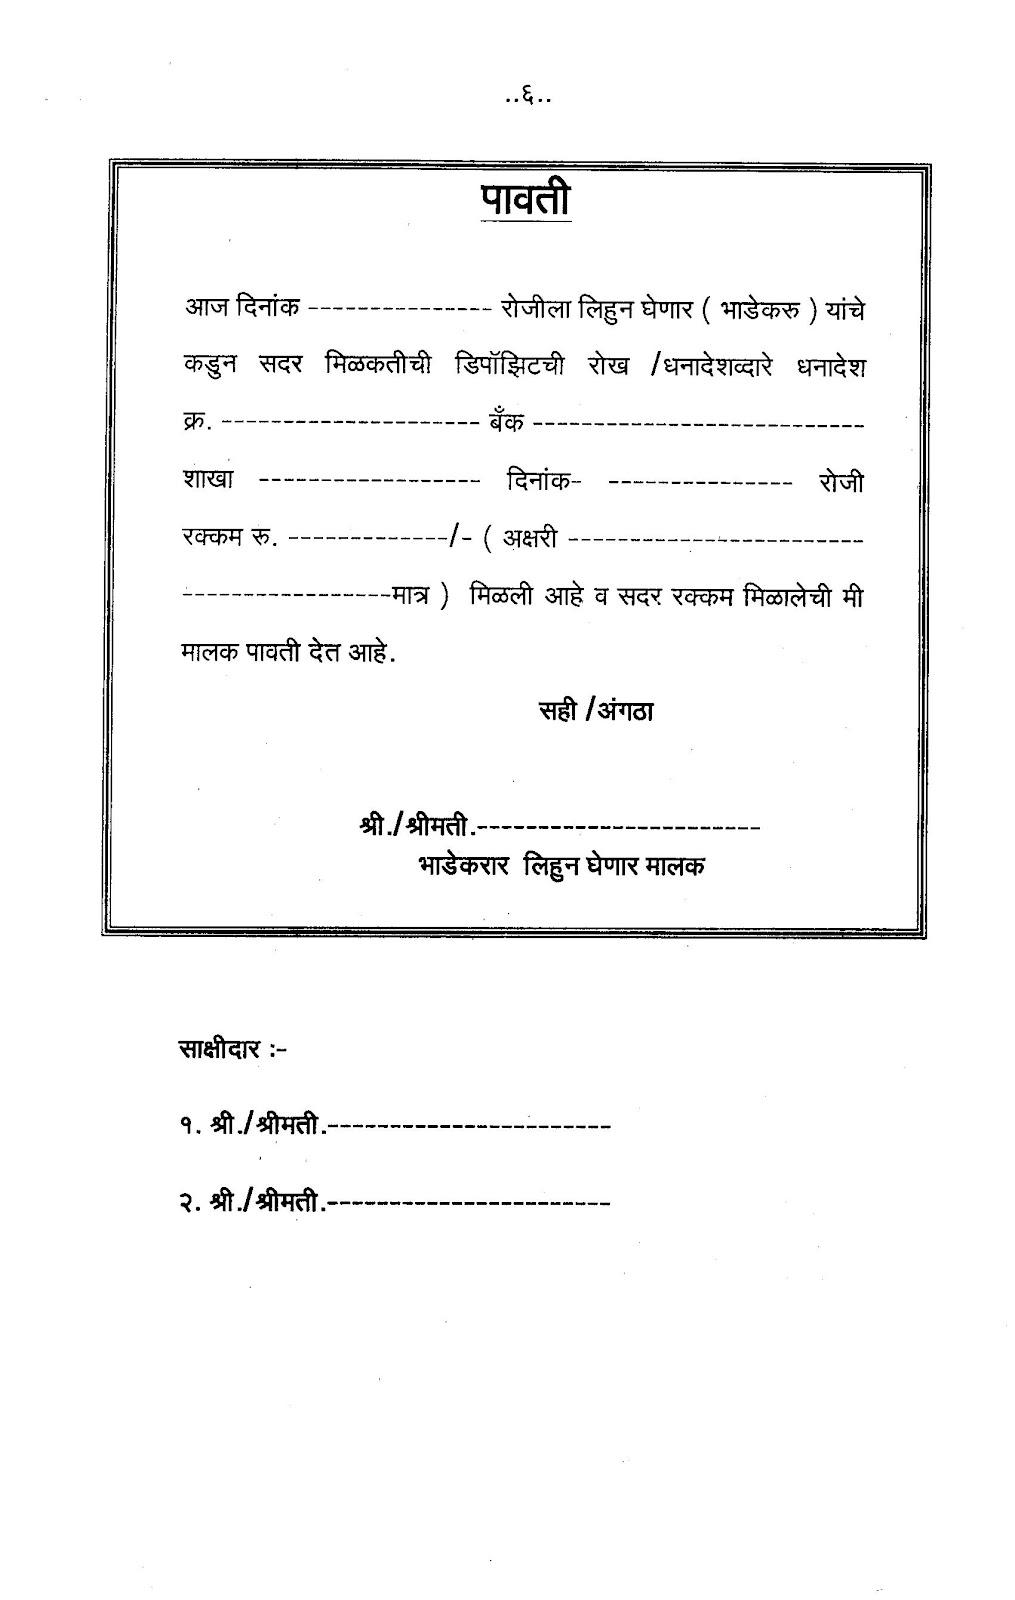 Rent Agreement Format Rent Agreement Format